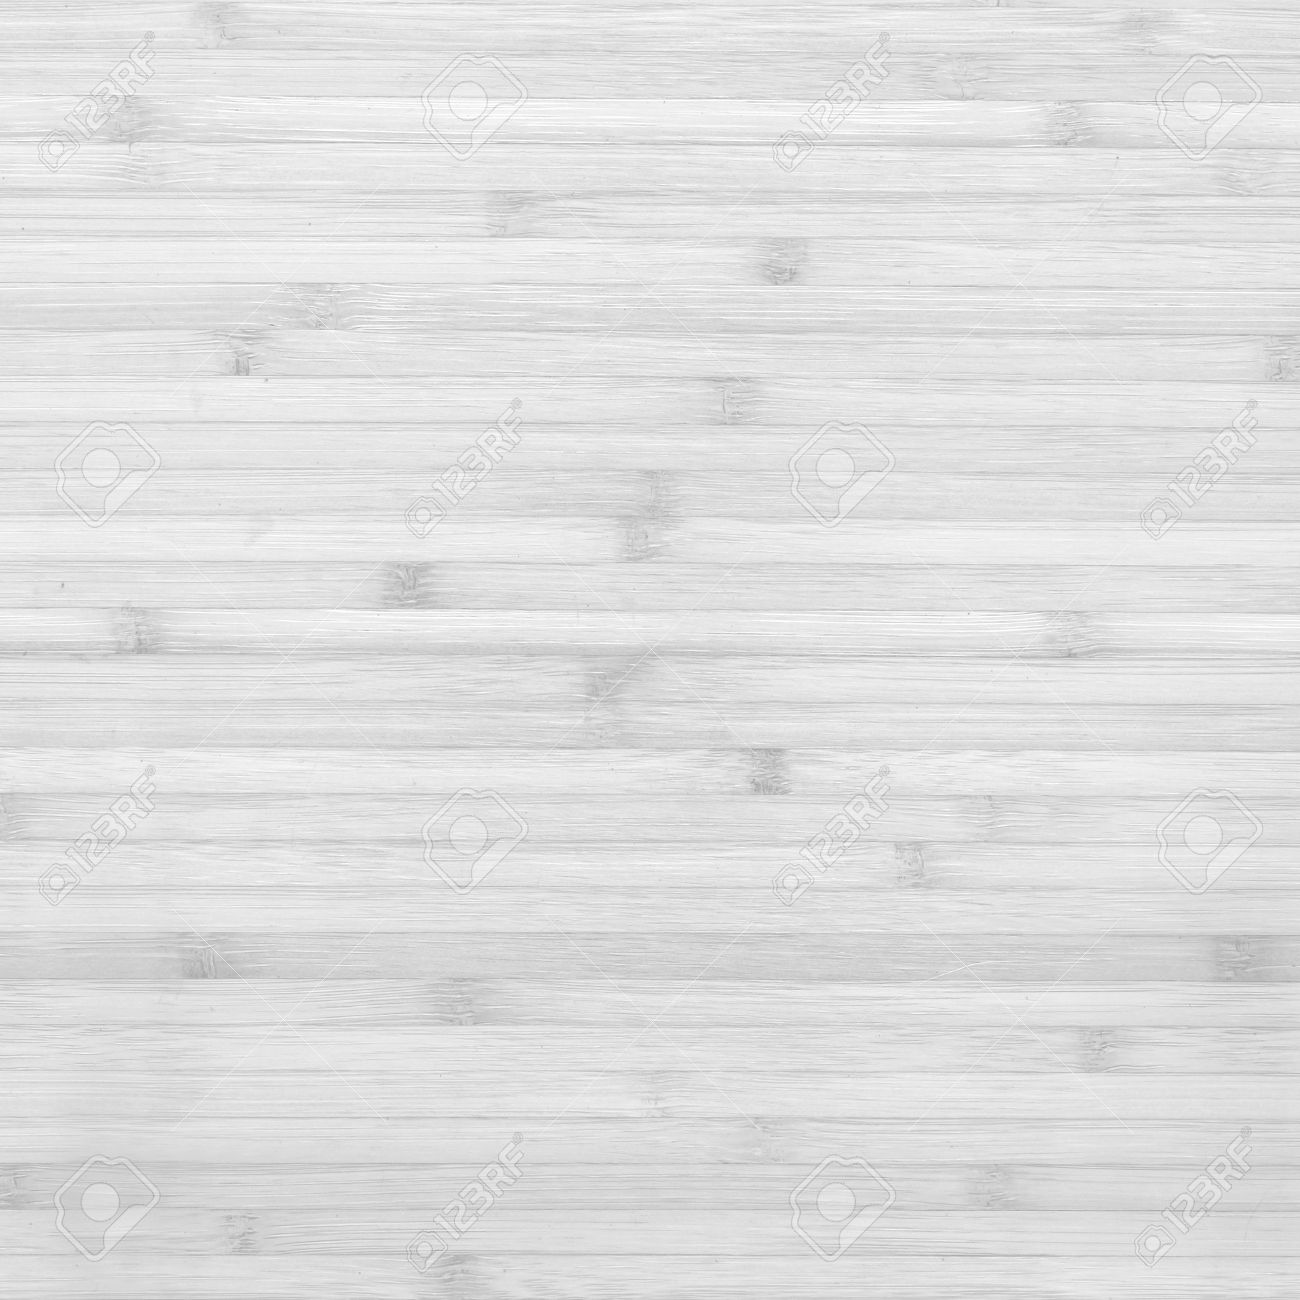 Immagini Stock Asse Di Legno Di Bambù Trama Sfondo Bianco Image